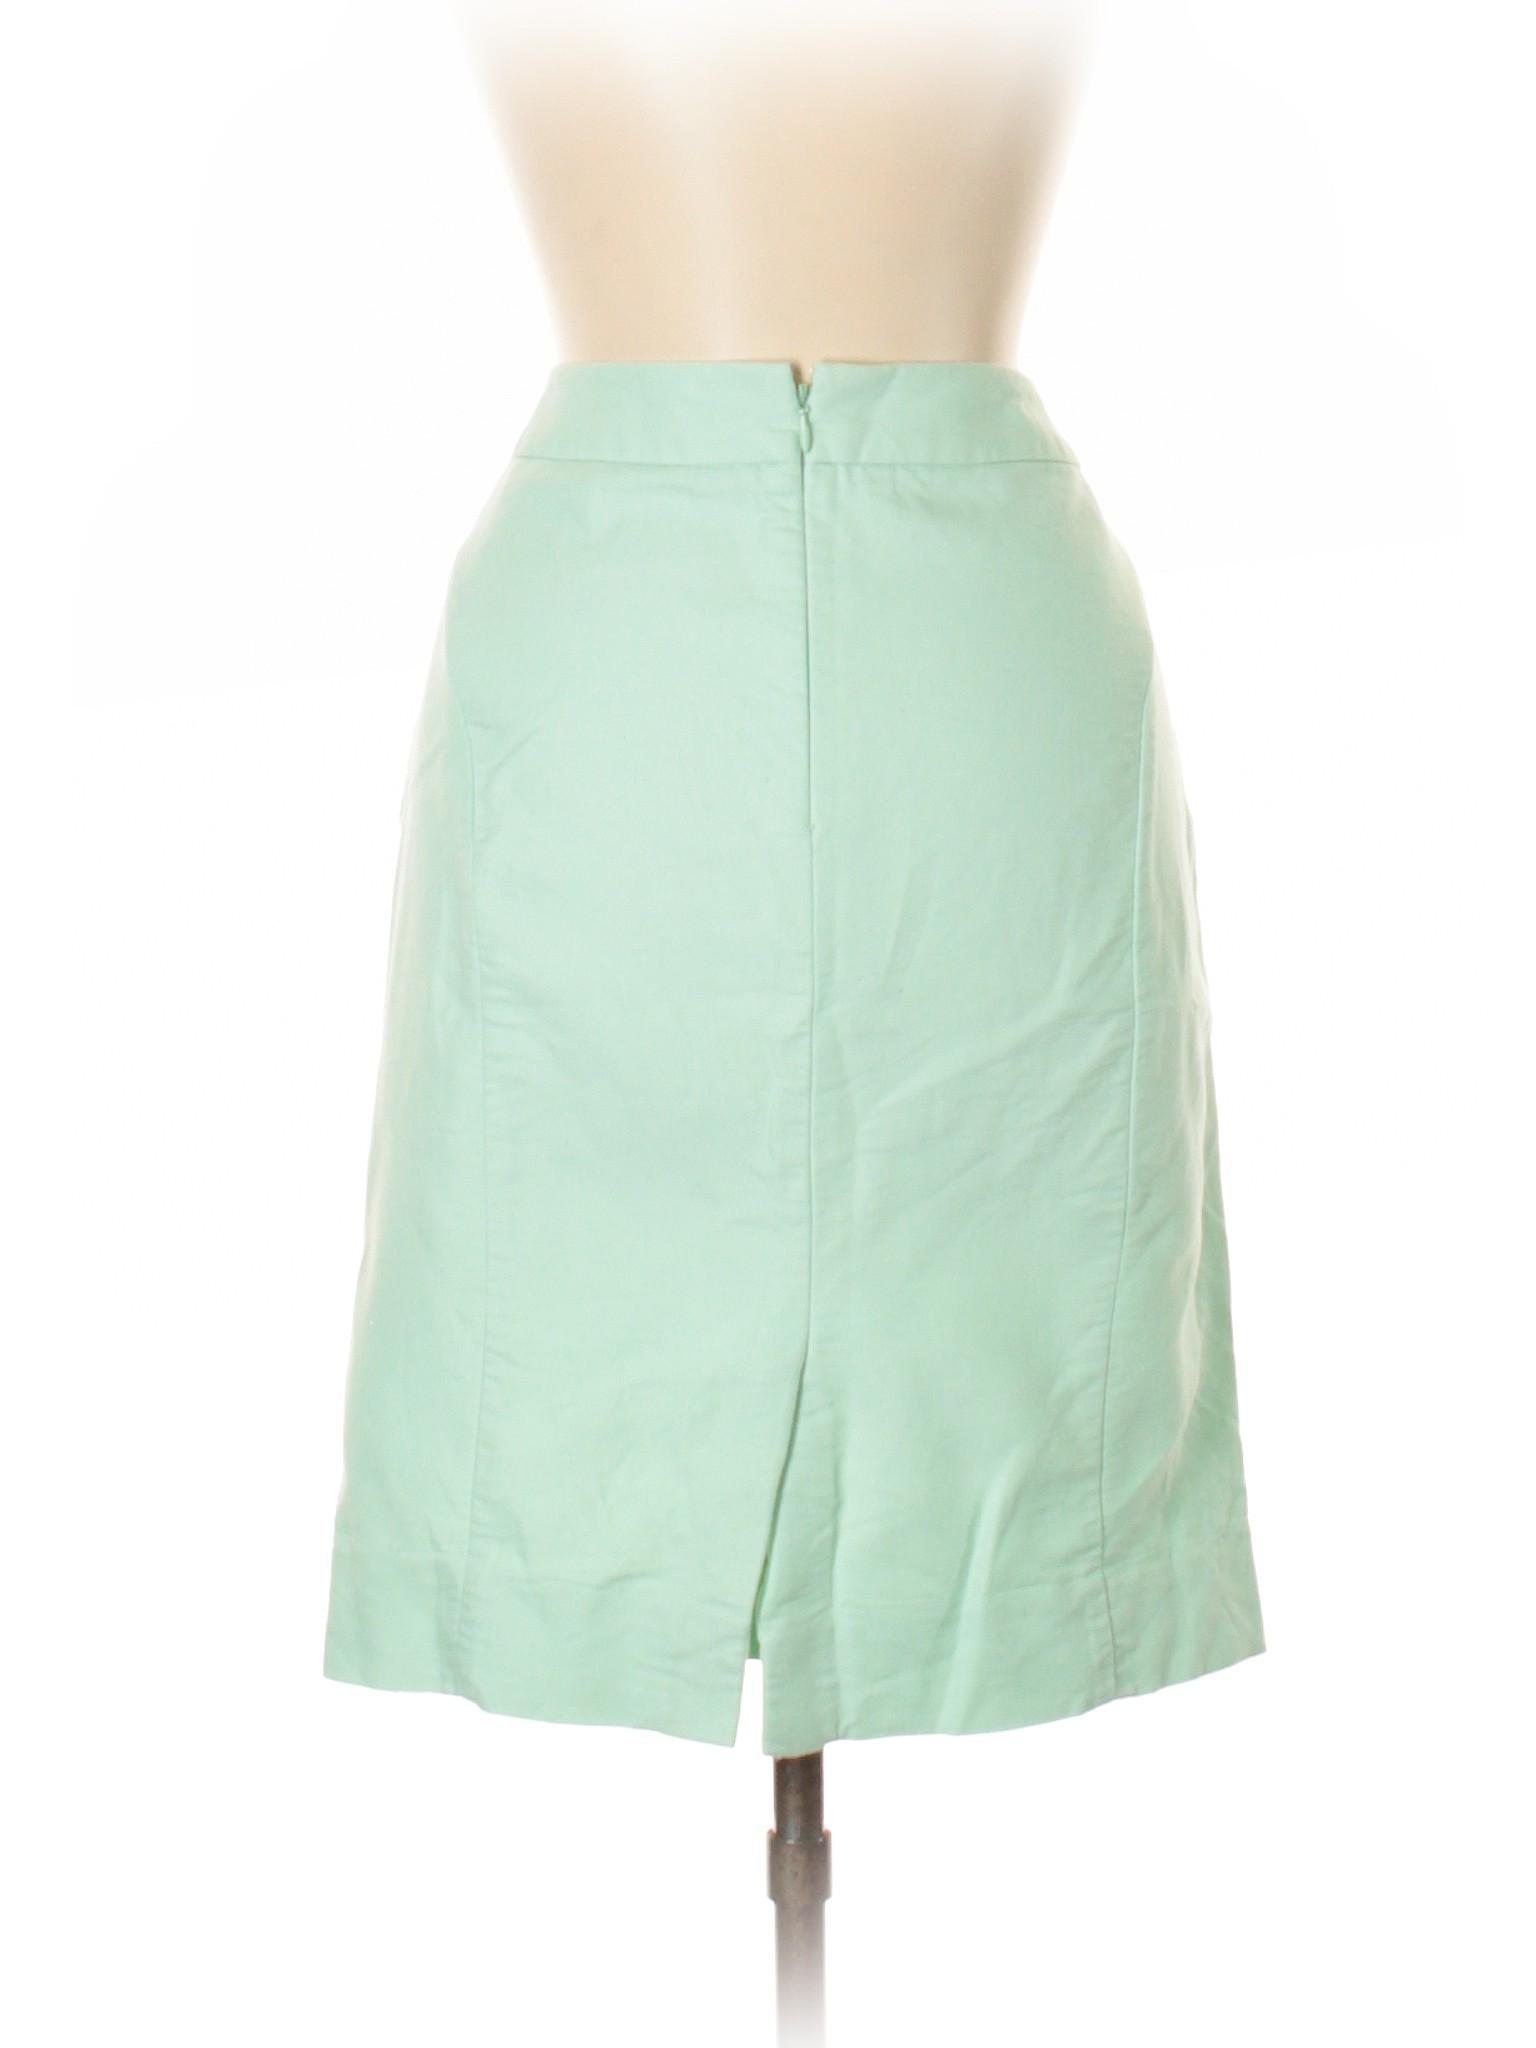 Boutique Skirt Boutique Boutique Skirt Boutique Casual Skirt Boutique Skirt Skirt Casual Casual Casual Casual Boutique Casual ZBxngOv